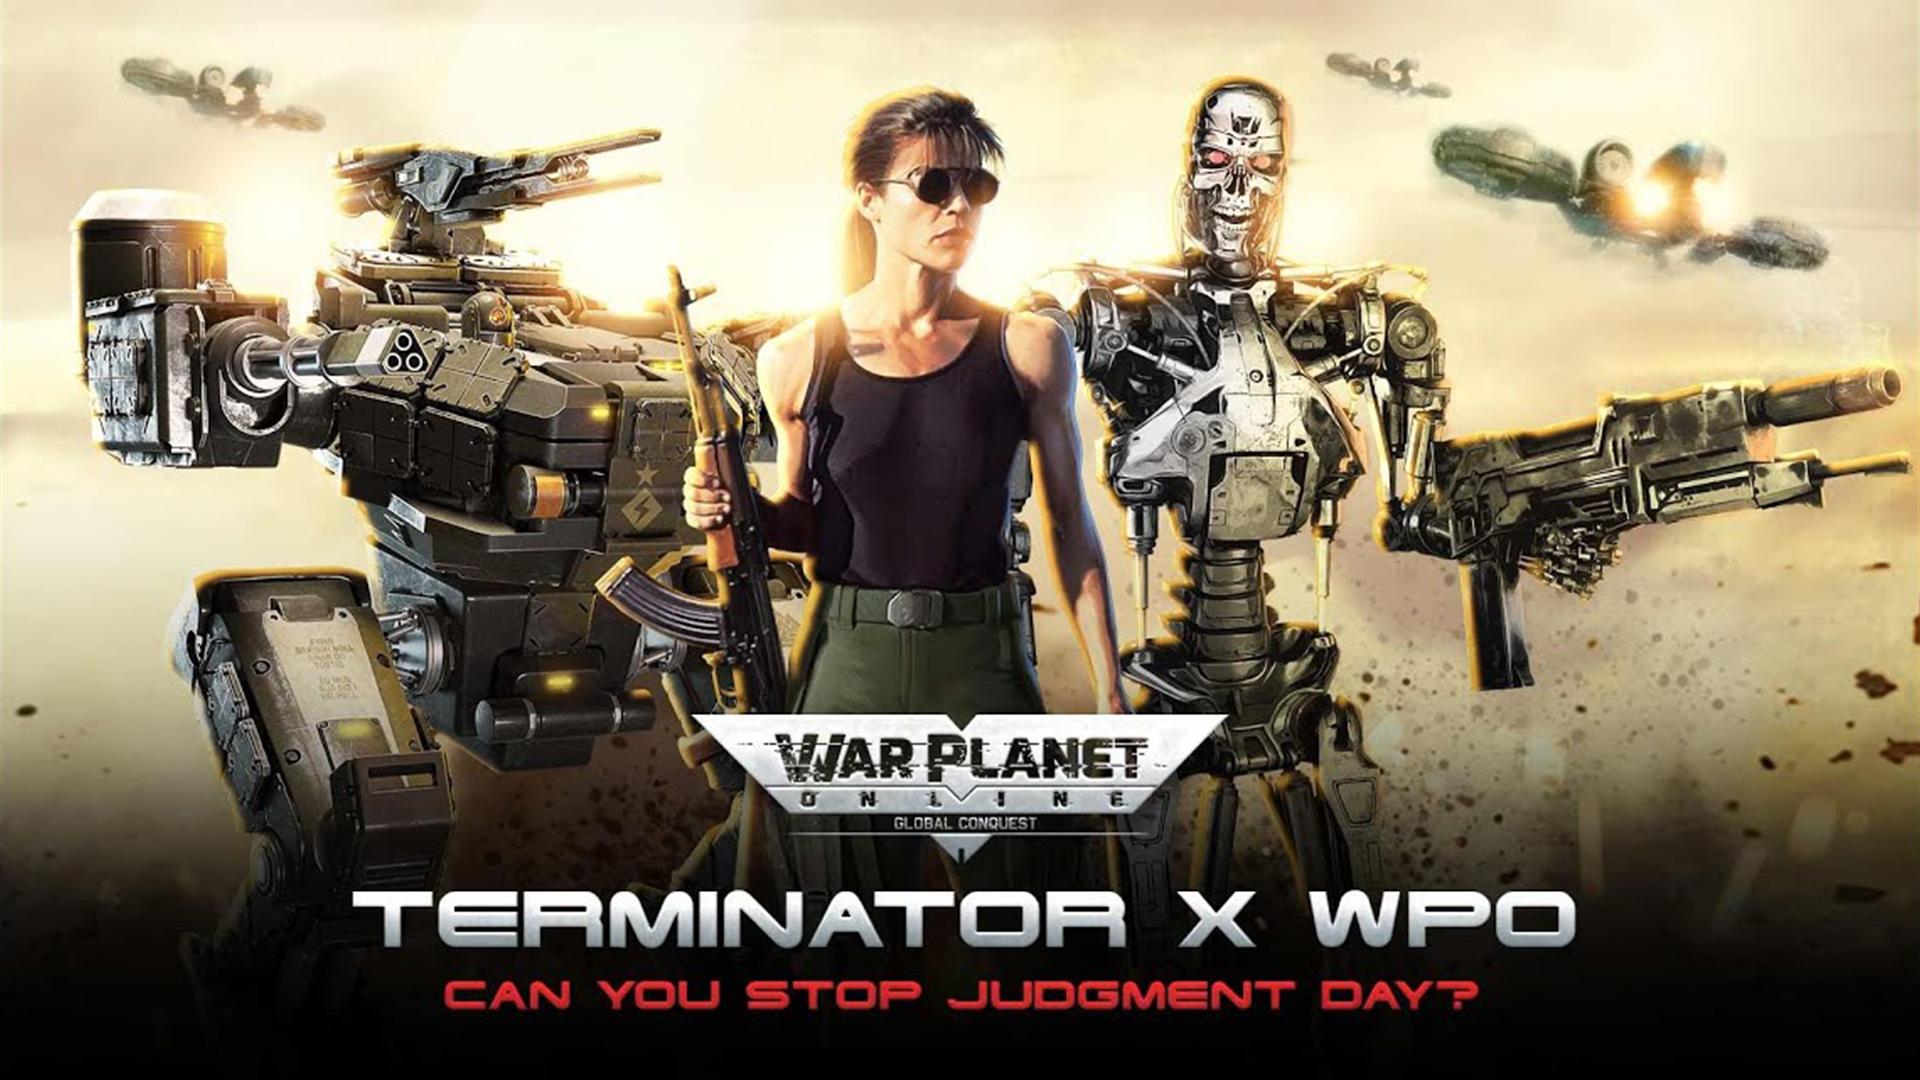 War Planet Online x Terminator 2: Judgment Day Teaser Trailer